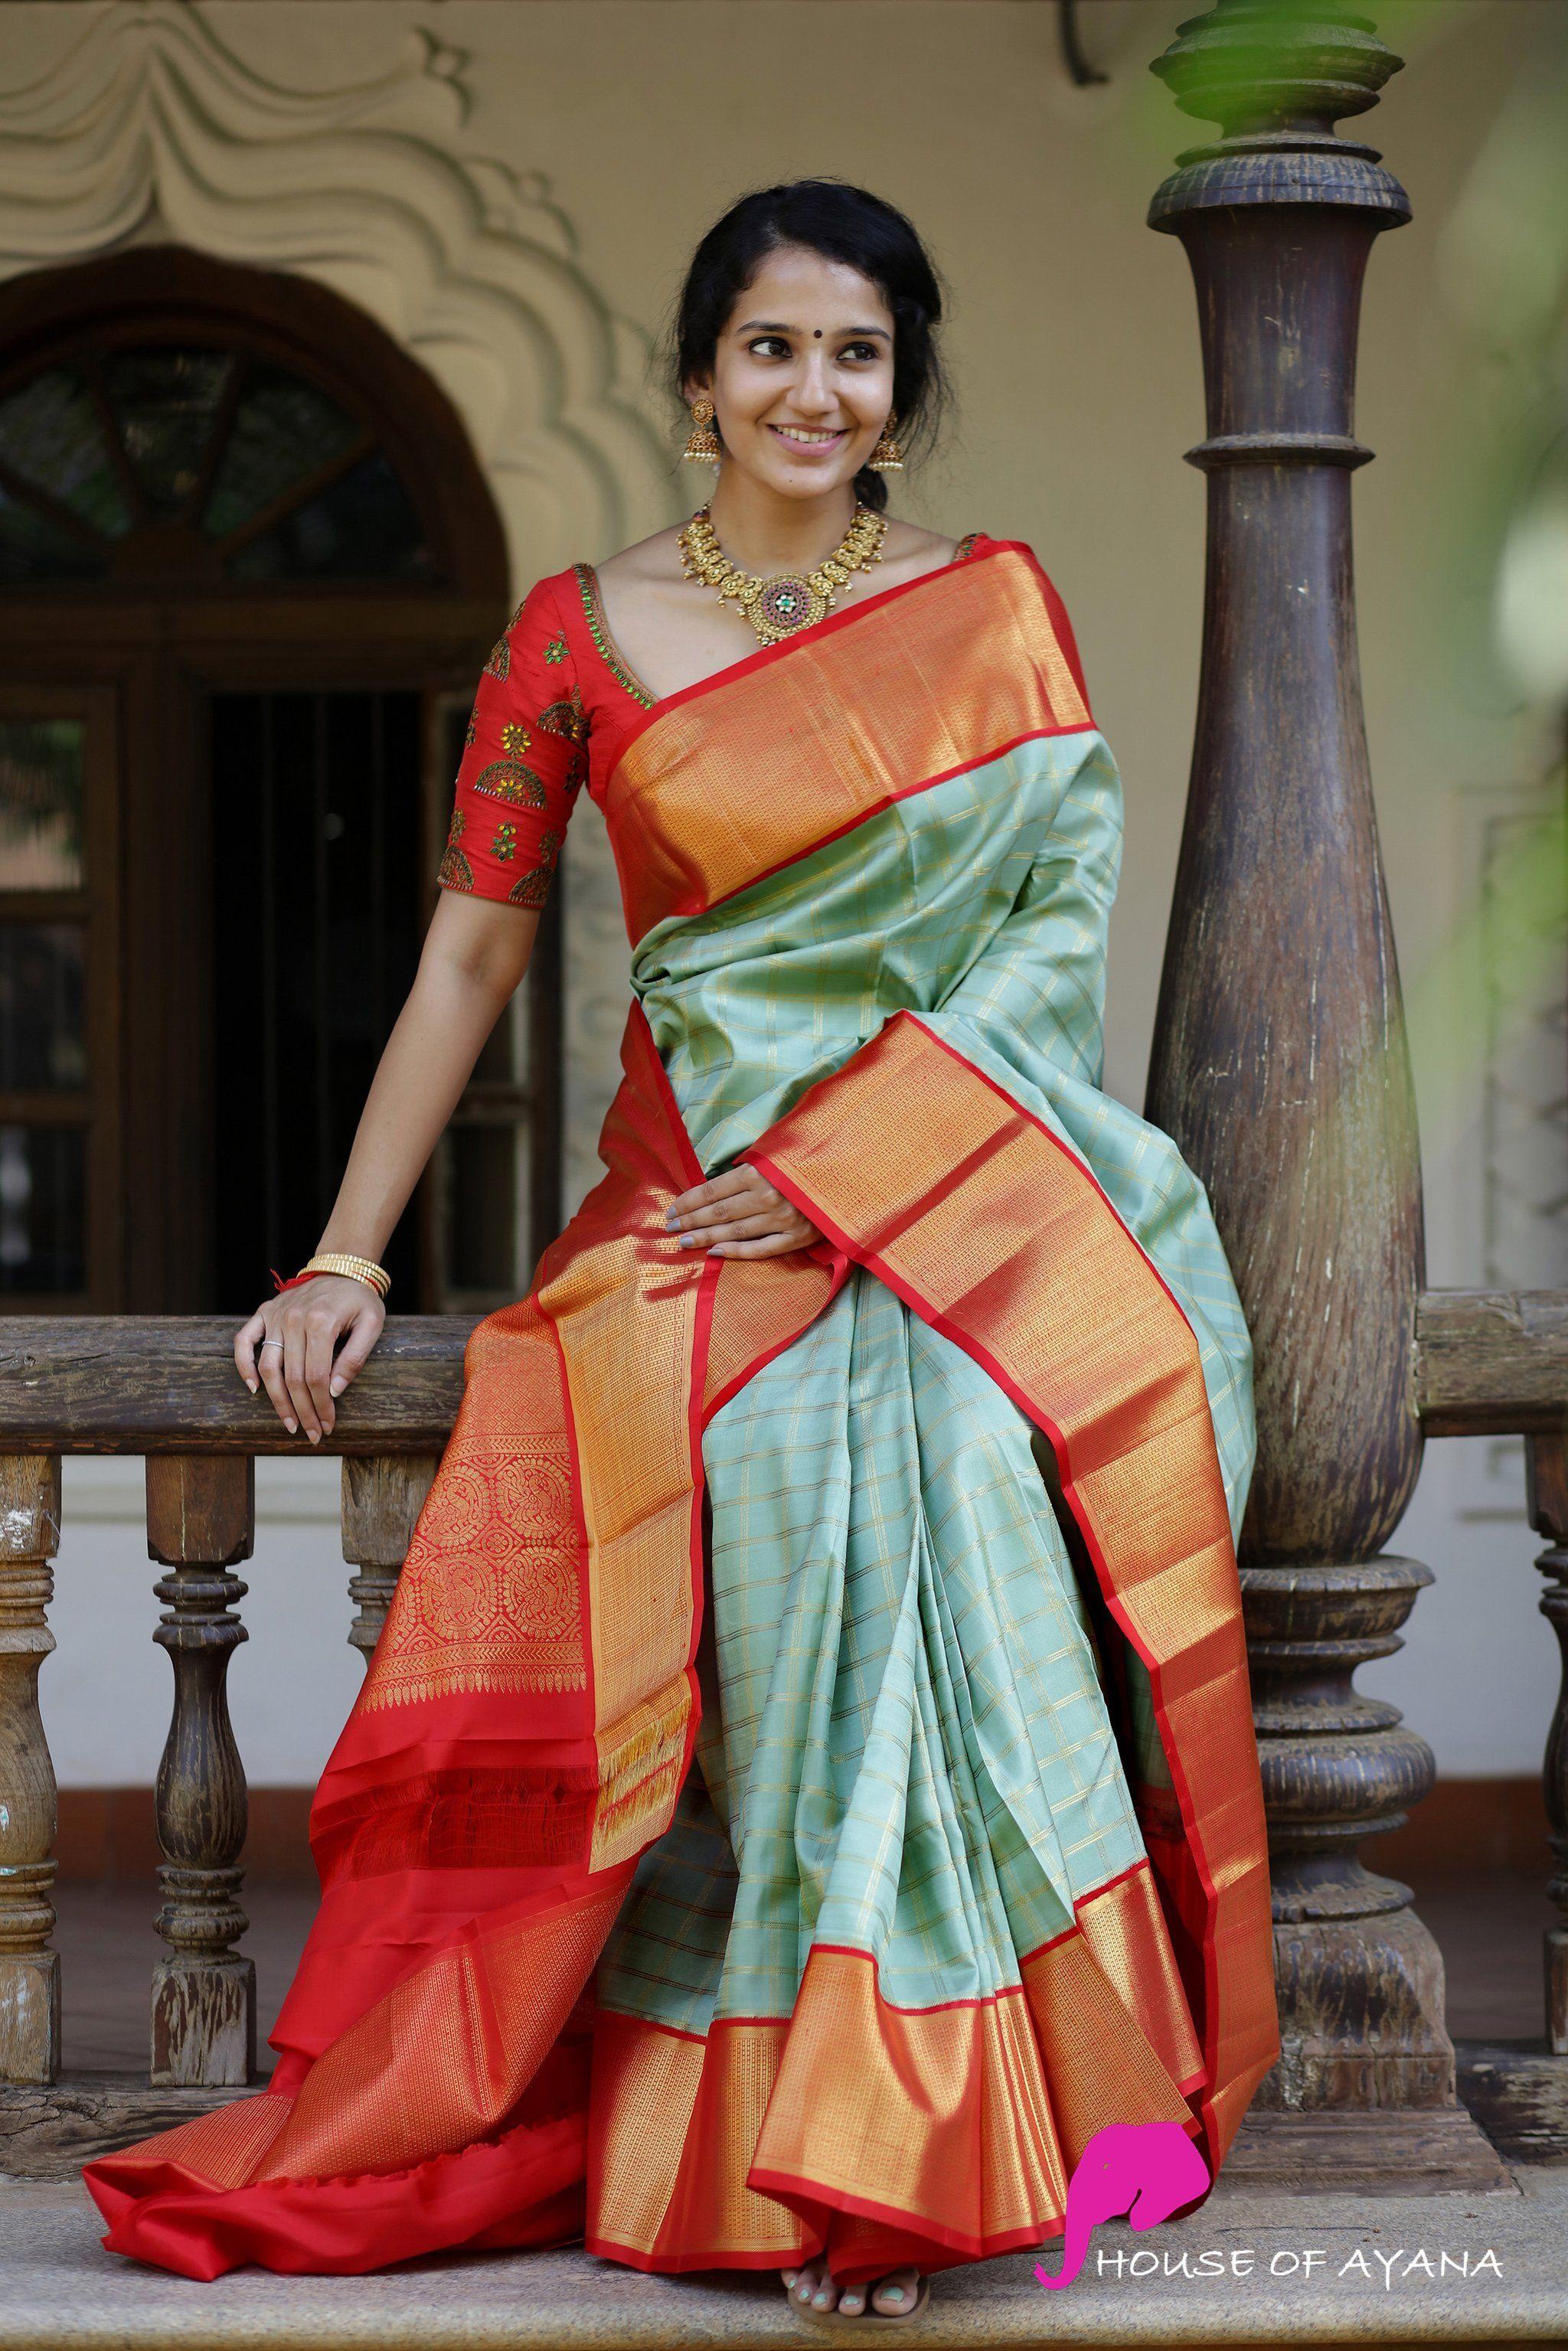 Kanchipuram Silk Sarees Shop In Chennai Bridal Kanchipuram Sarees House Of Ayana Kanjiv In 2020 Silk Saree Blouse Designs Kanjivaram Sarees Silk Bridal Silk Saree